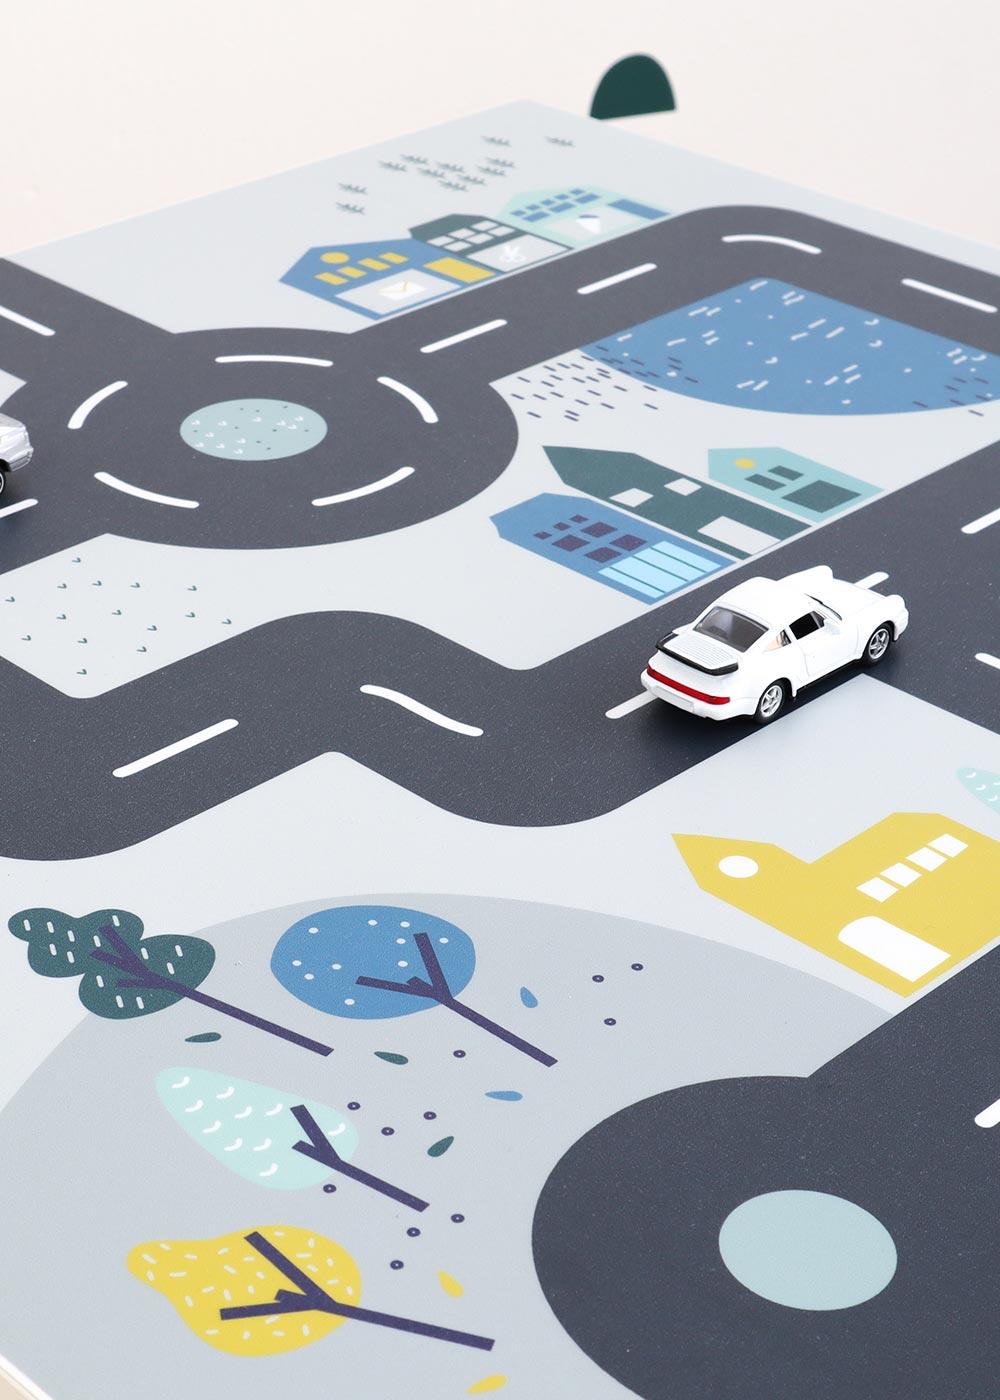 Klebefolie Ikea Lätt Smastraat Detailansicht mit Kreisverkehr